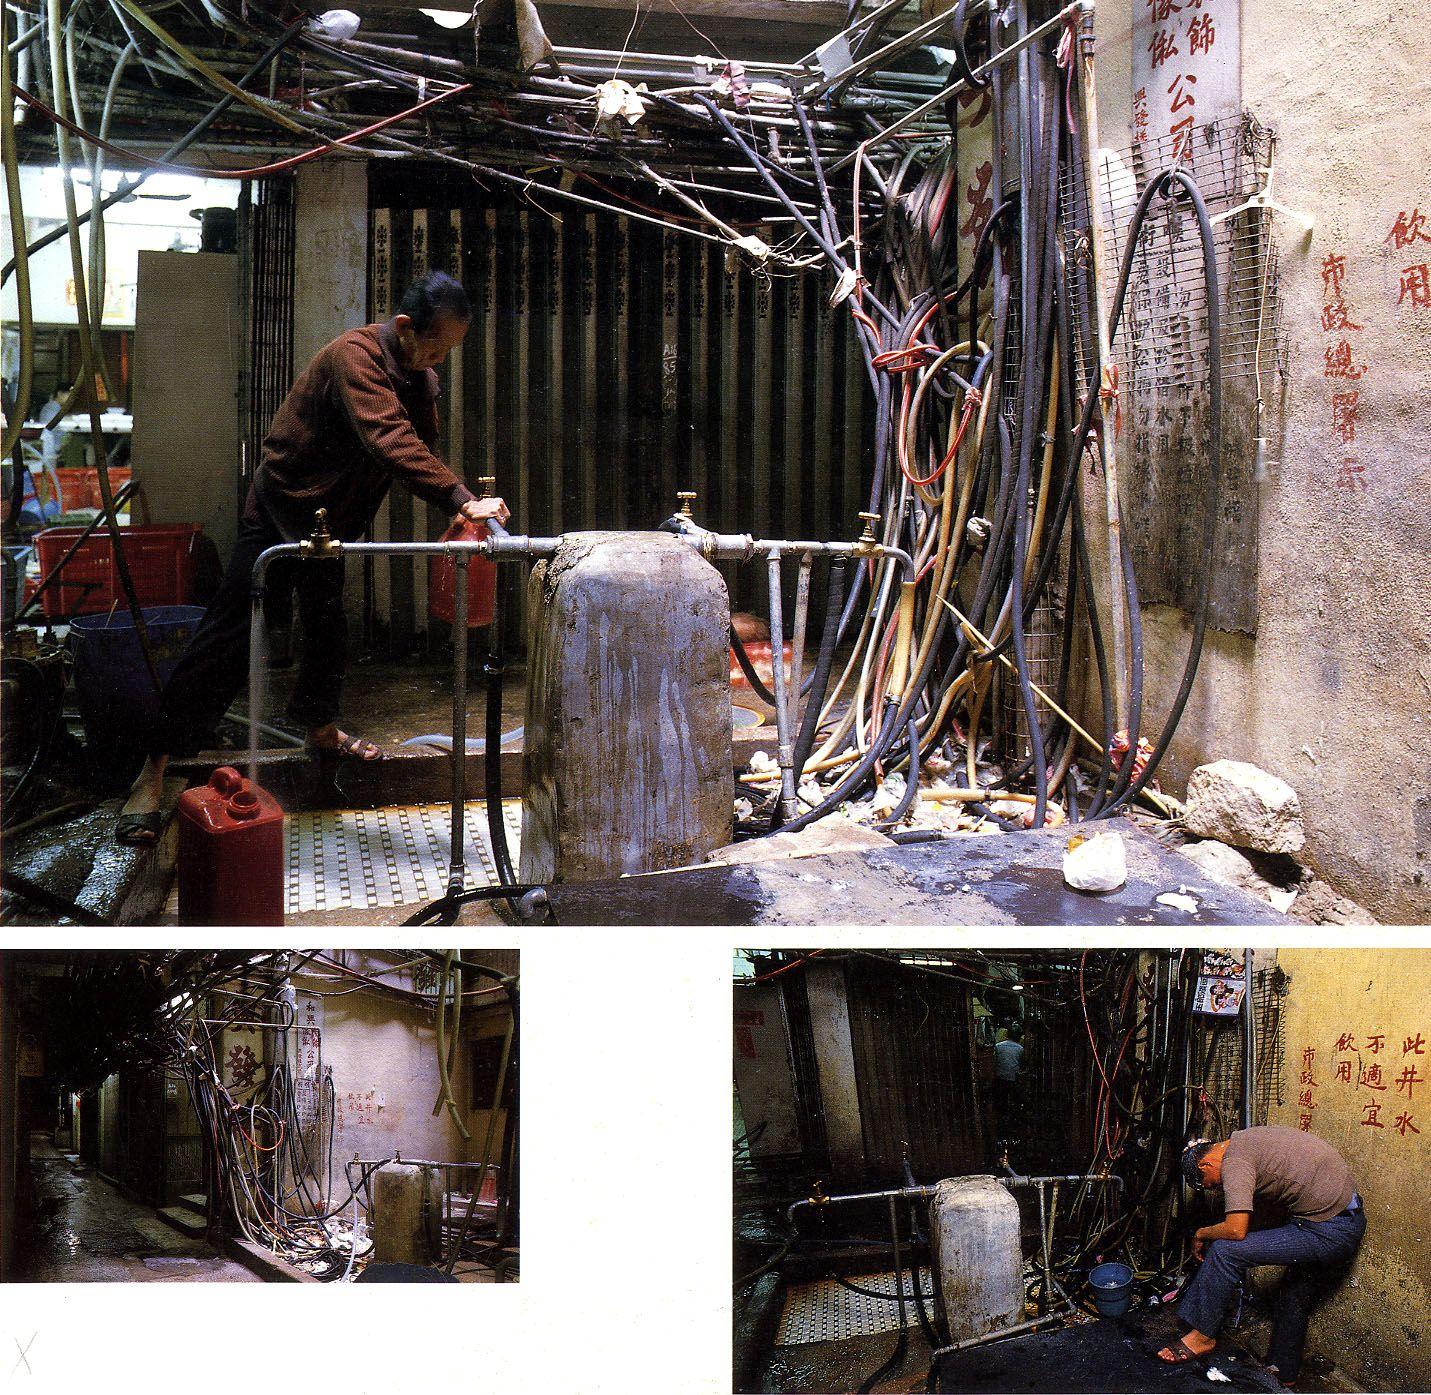 Water Pump In Kowloon Kowloon Walled City Kowloon Cyberpunk City